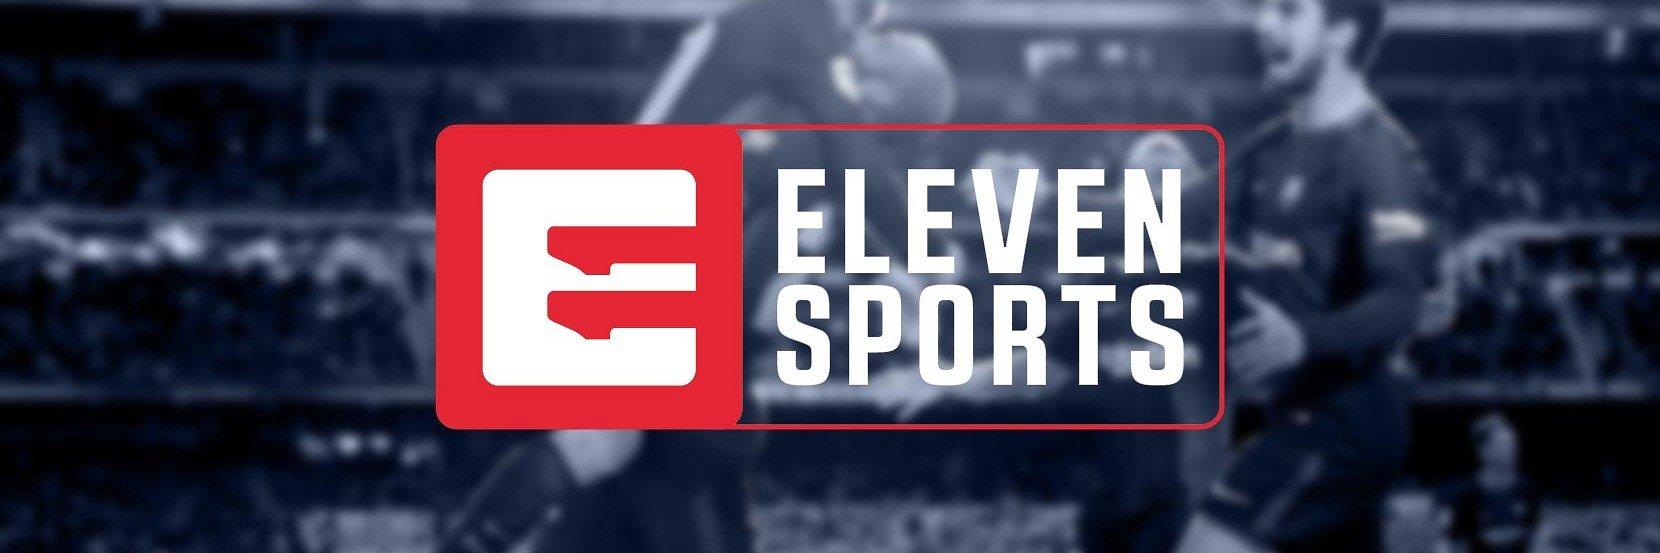 LaLiga e Eleven Sports promovem LaLiga Experience